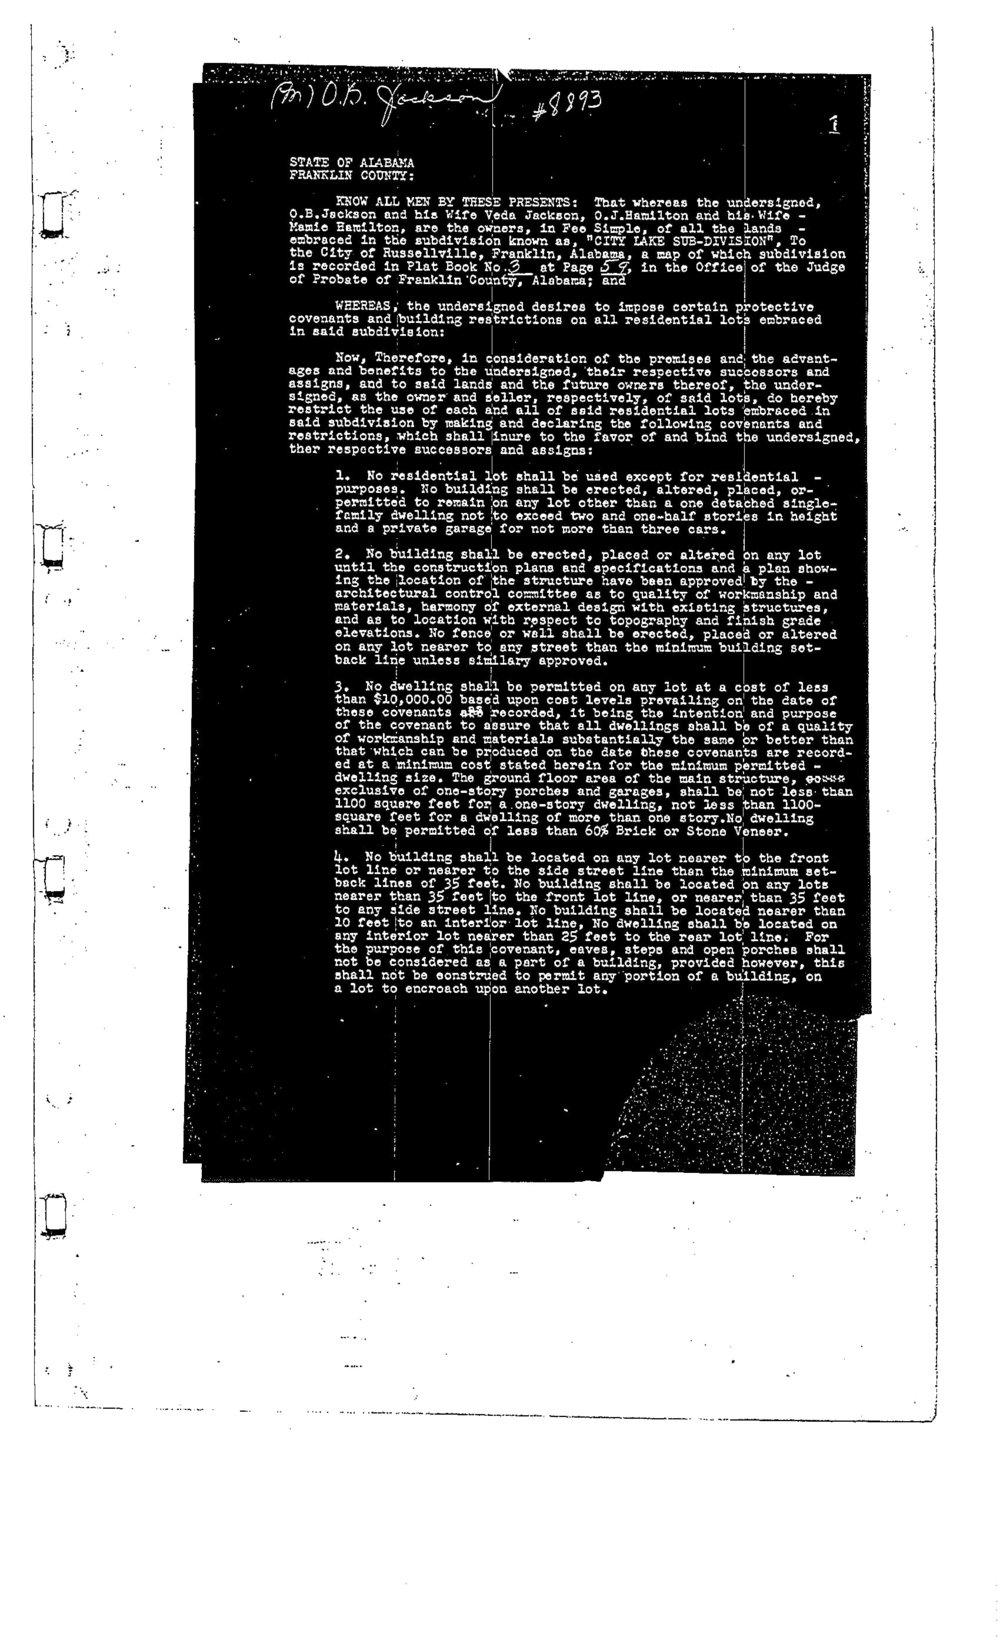 Covenants-City-Lake-Subdivision-Franklin-Co-1.jpg